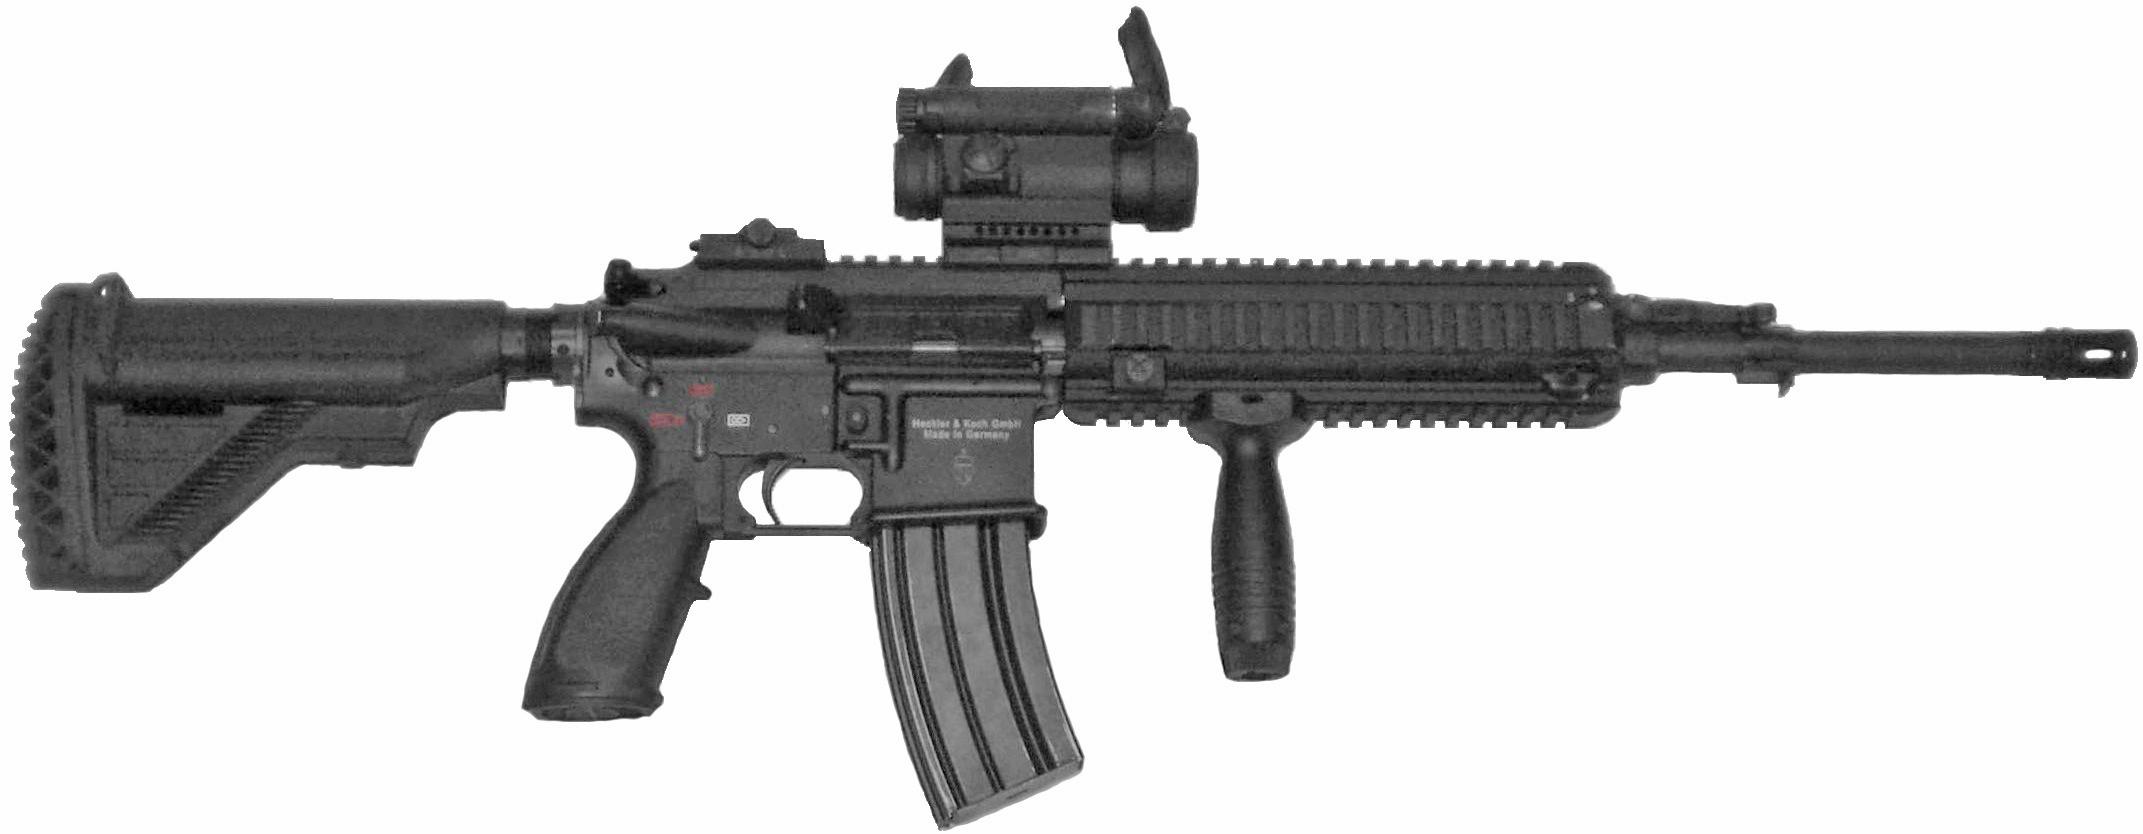 H&K HK416 - Wikiwand